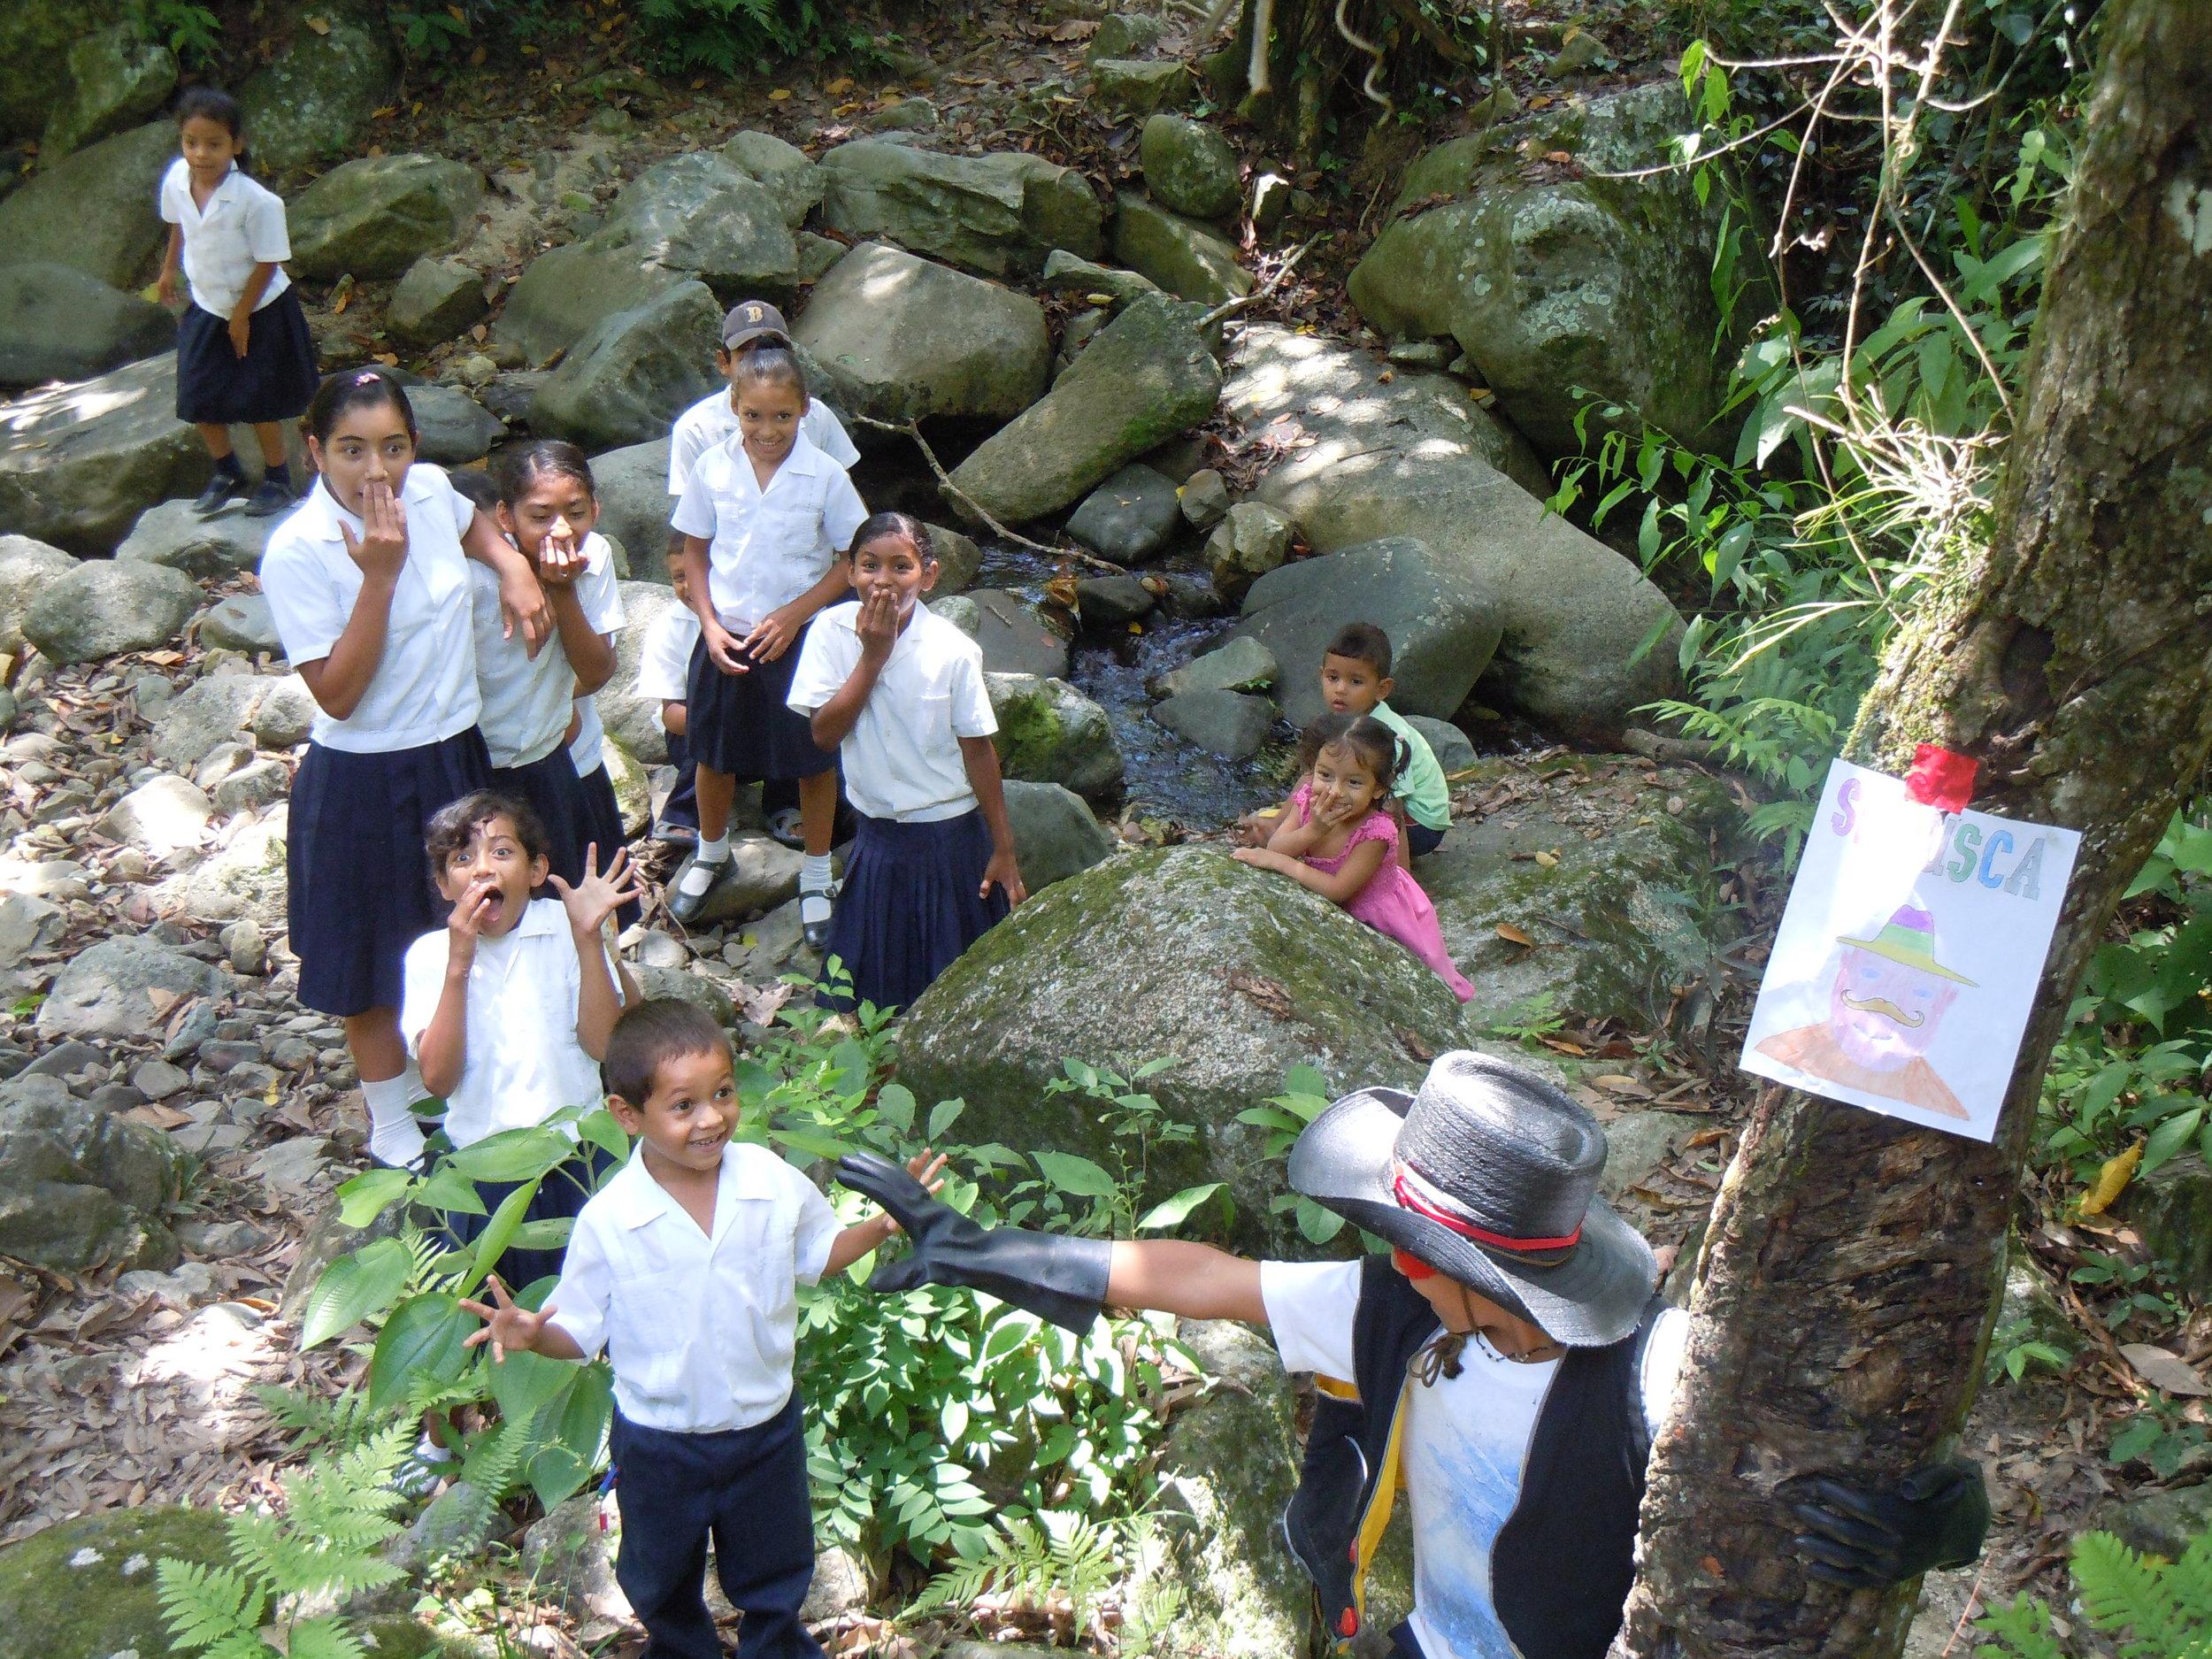 Bibliobandido citing in La Muralla, Honduras, 2008 Photo by Marisa Morán Jahn